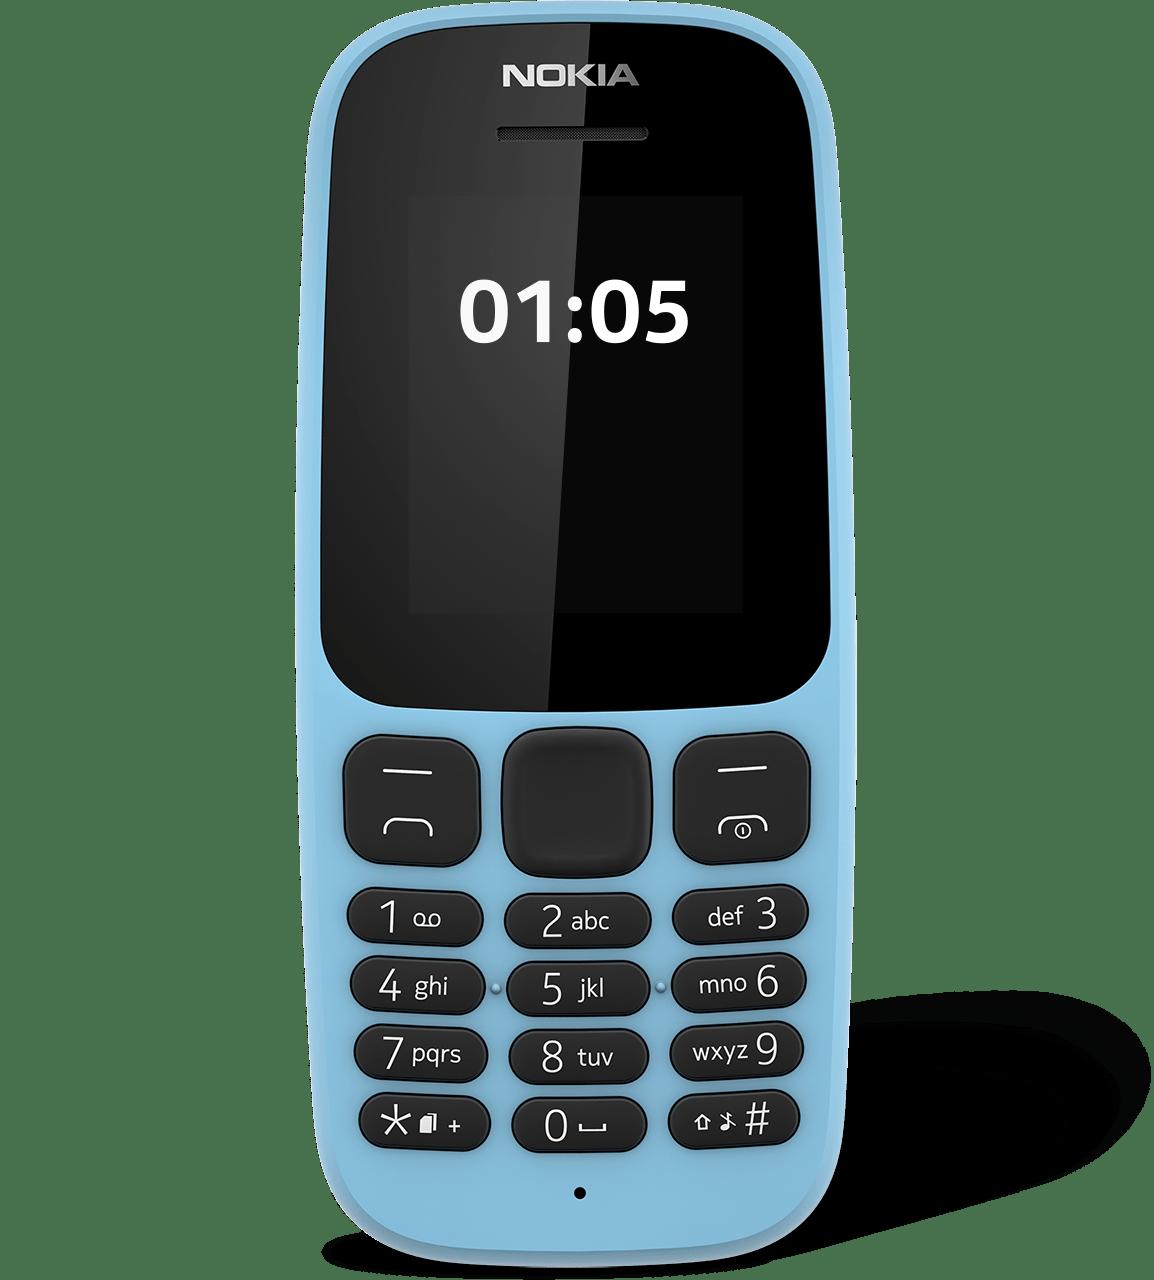 Nokia_105-Hero.png